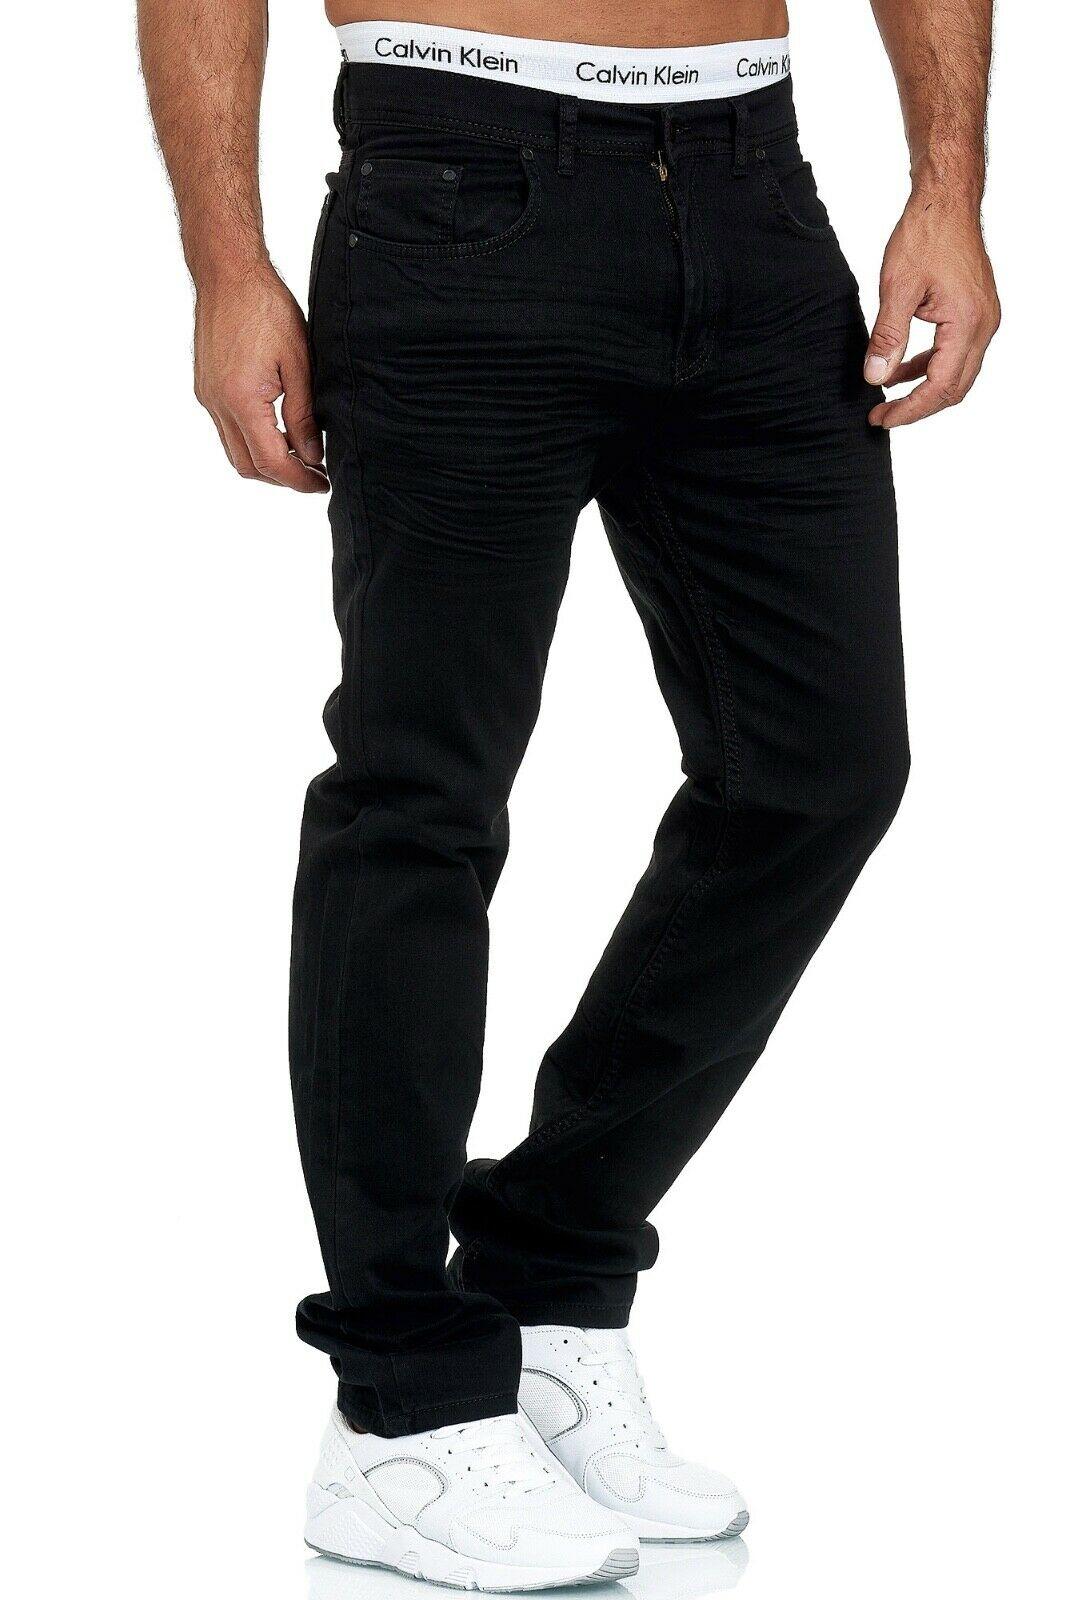 Herren-Jeans-Hose-Denim-KC-Black-Washed-Straight-Cut-Regular-Dicke-Naht-naehte Indexbild 78